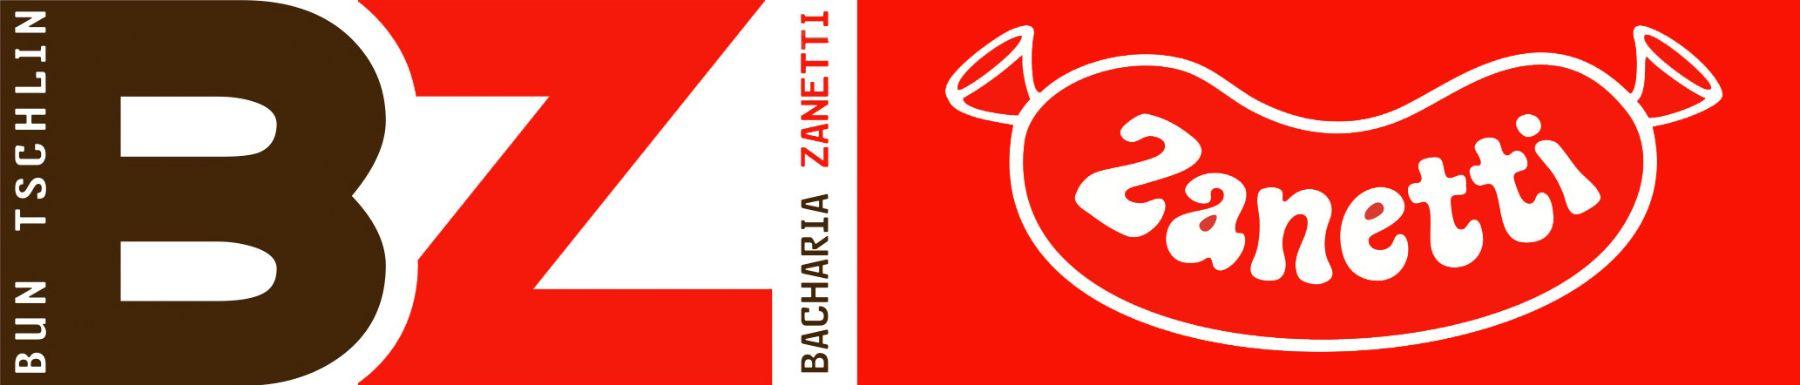 Logo-Zanetti-BT.jpg